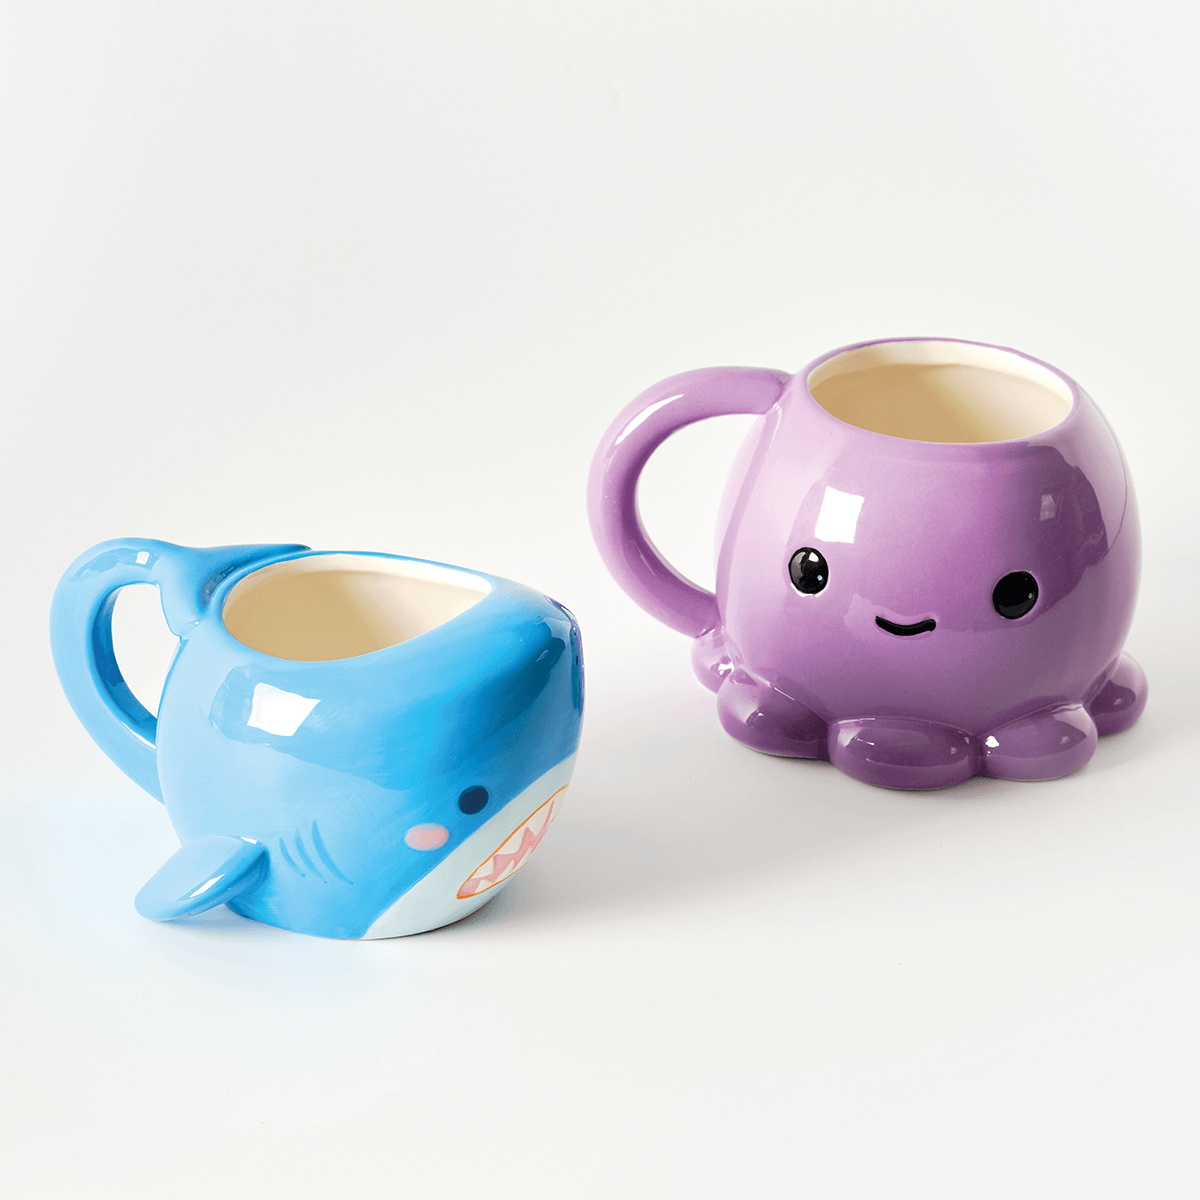 Mugs from Puckator UK